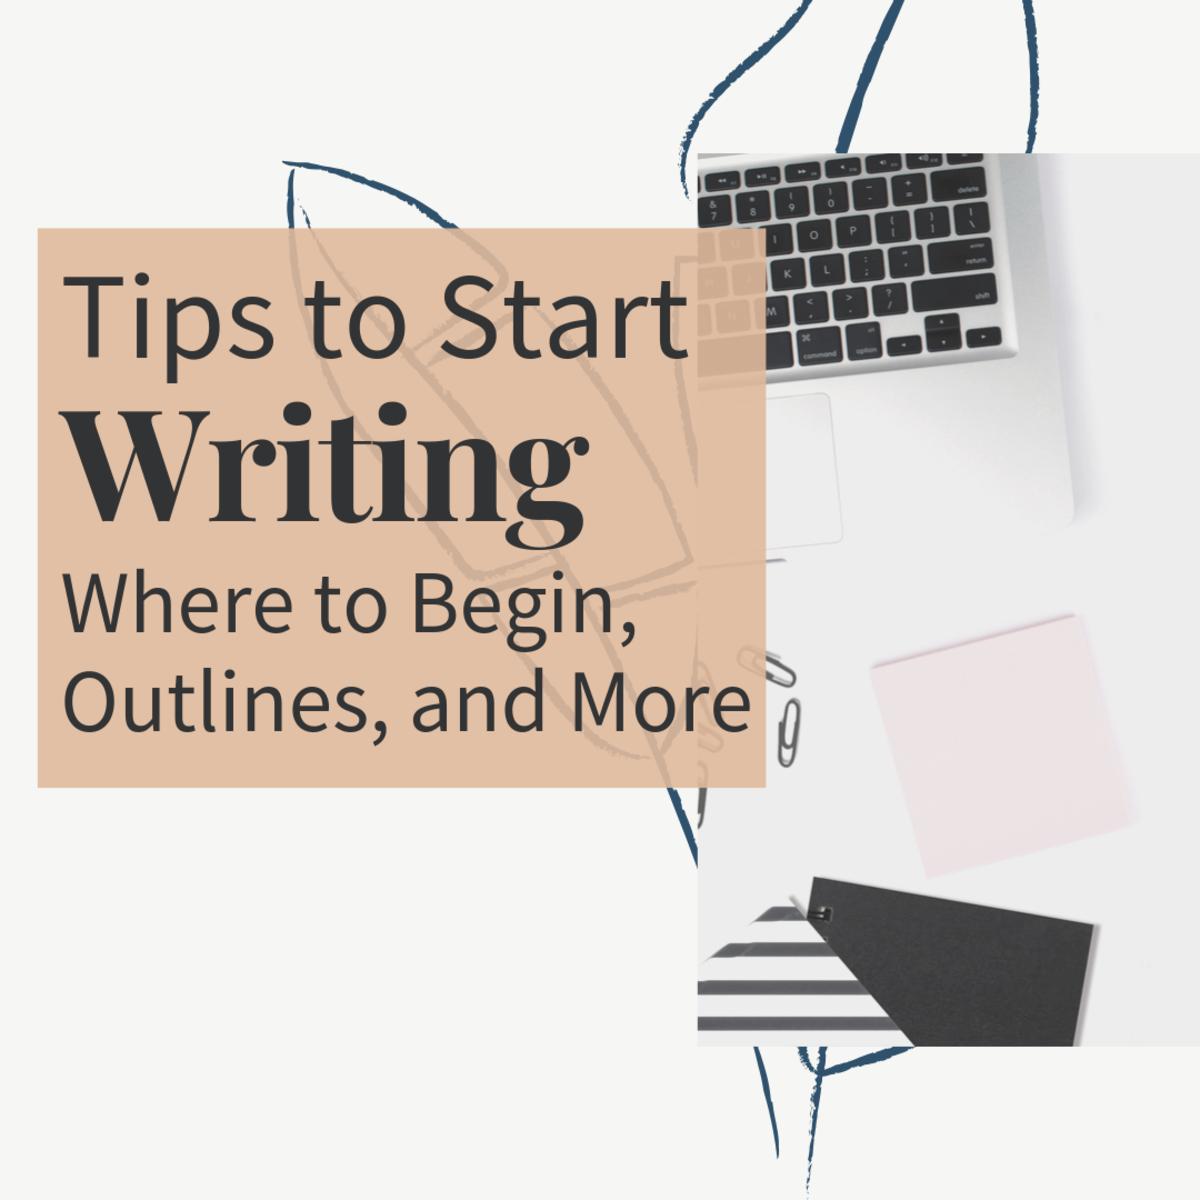 Tips to Start Writing